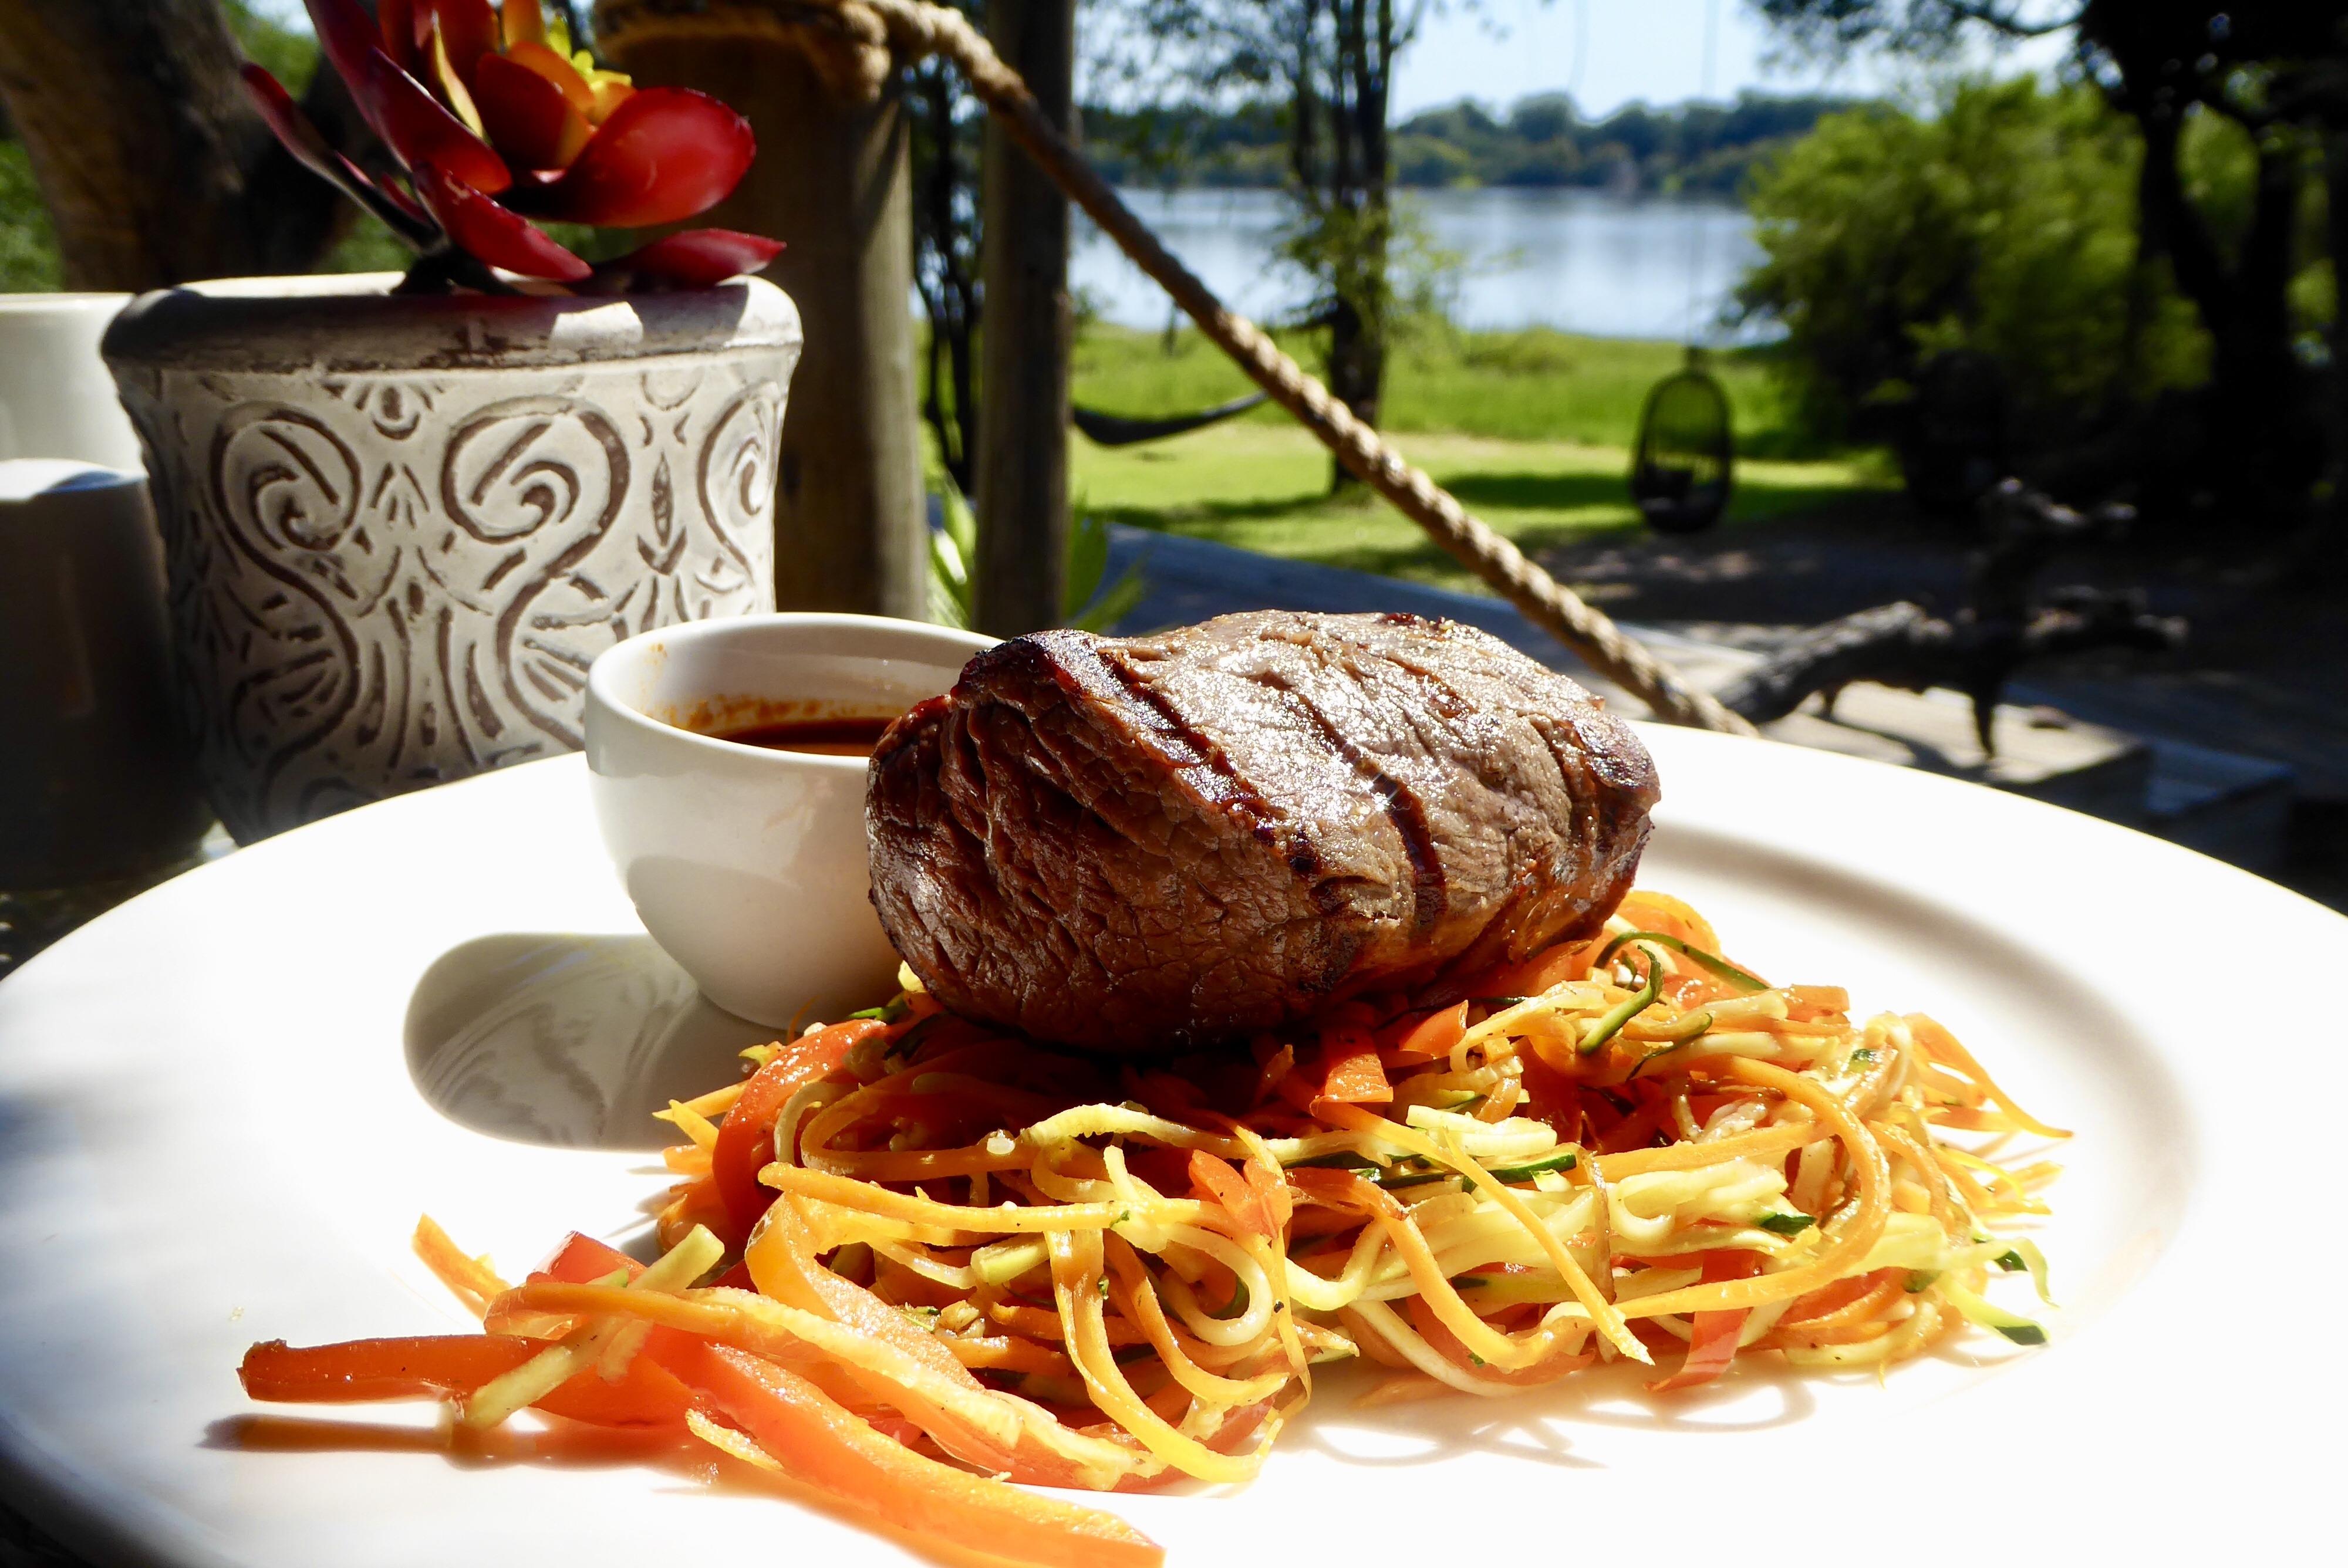 IMG 9833 - Eat a Mountain of Veggies-Daily!